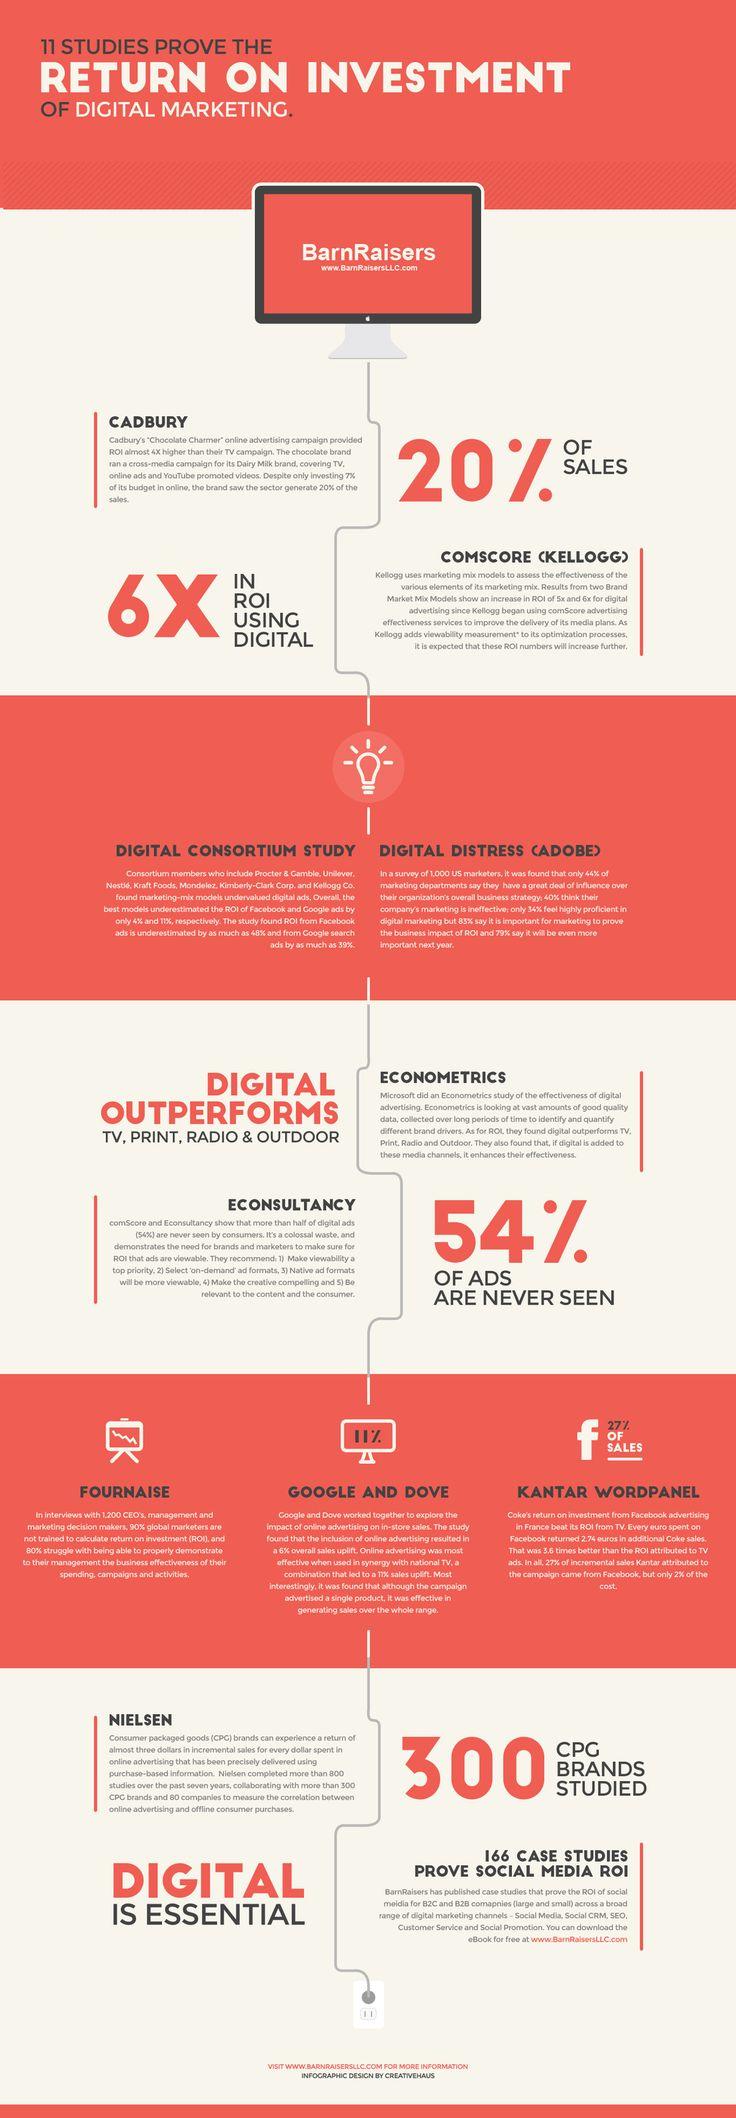 11 Studies Prove Return on Investment of Digital Marketing #infographic #Marketing #Advertising #DigitalMarketing